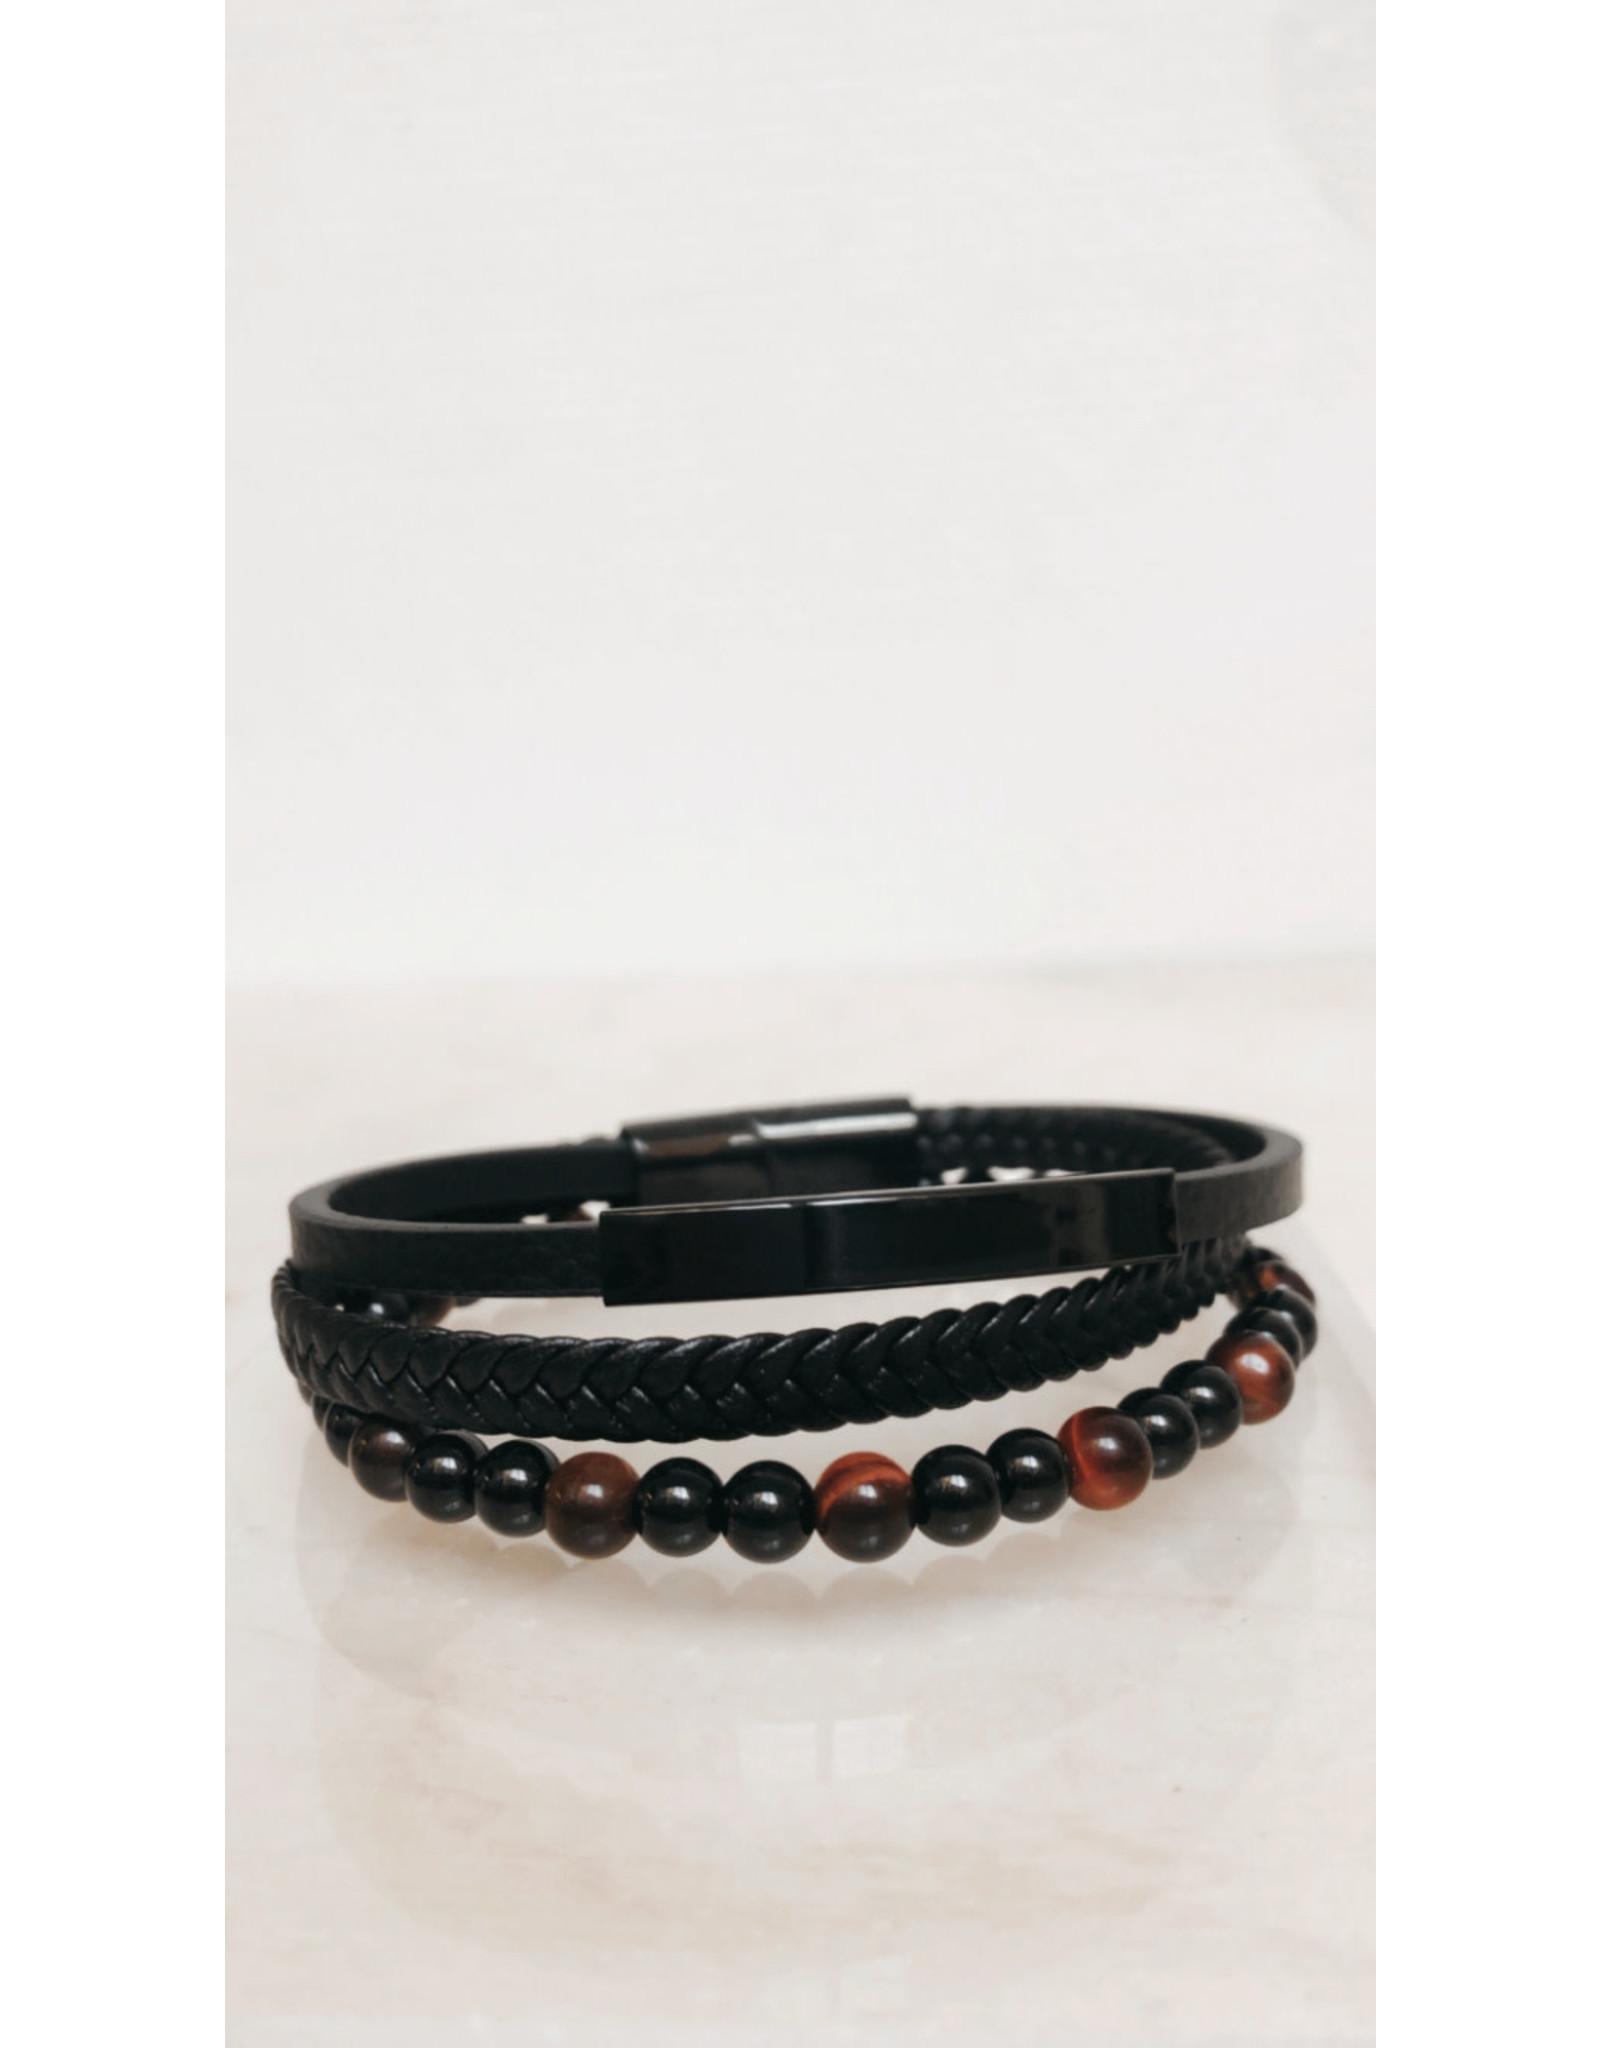 Juwelen Armband - Zwarte en rode parels, Lederen vlecht en ledere band - Mageneet sluiting  - 23 cm